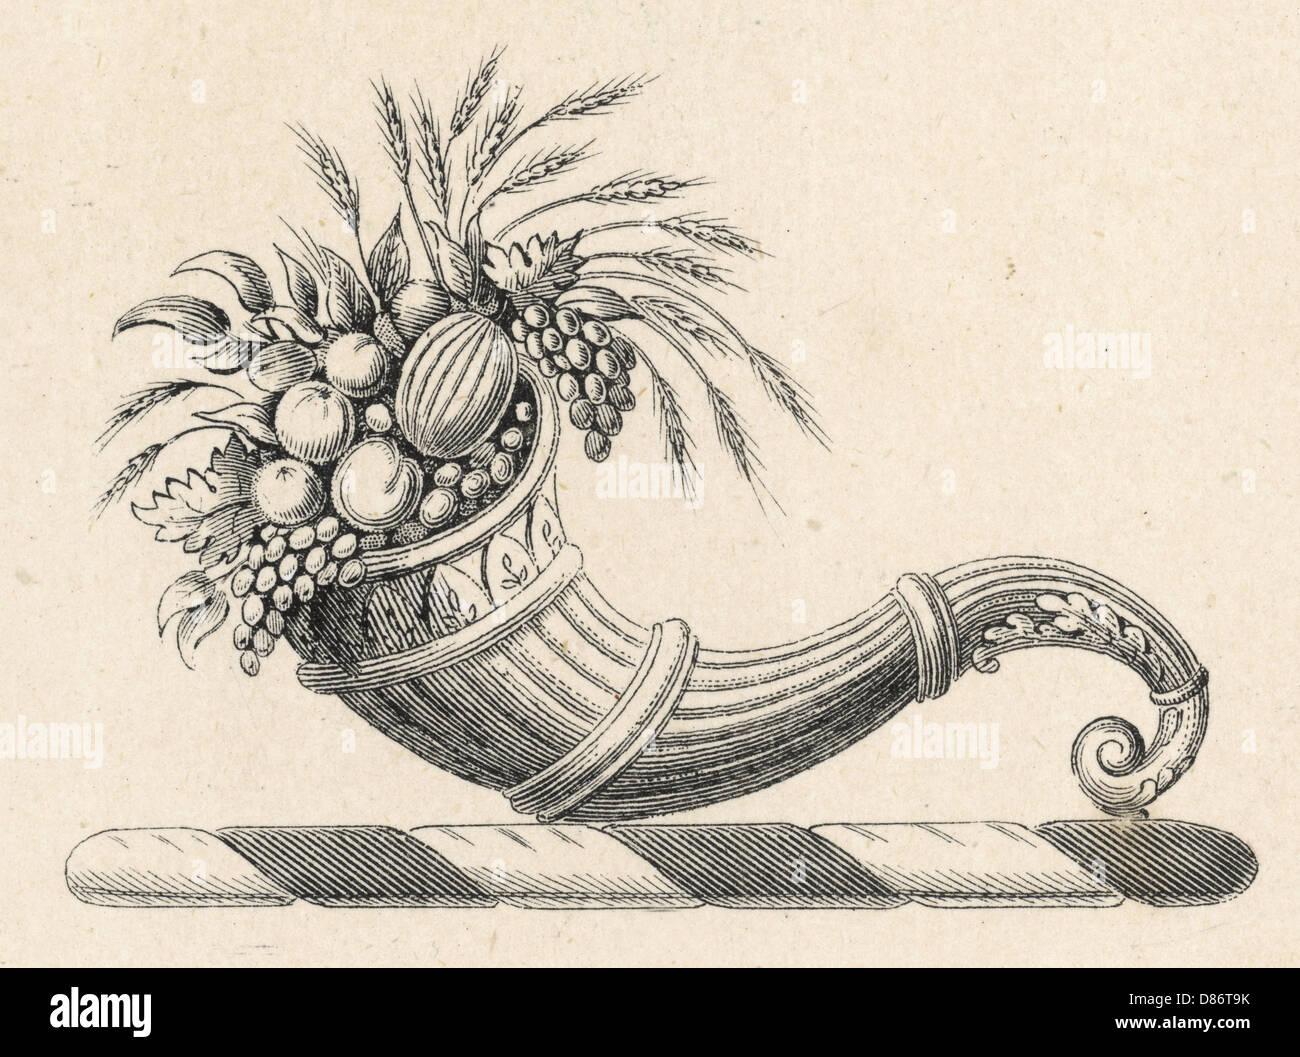 Cornucopia - Stock Image